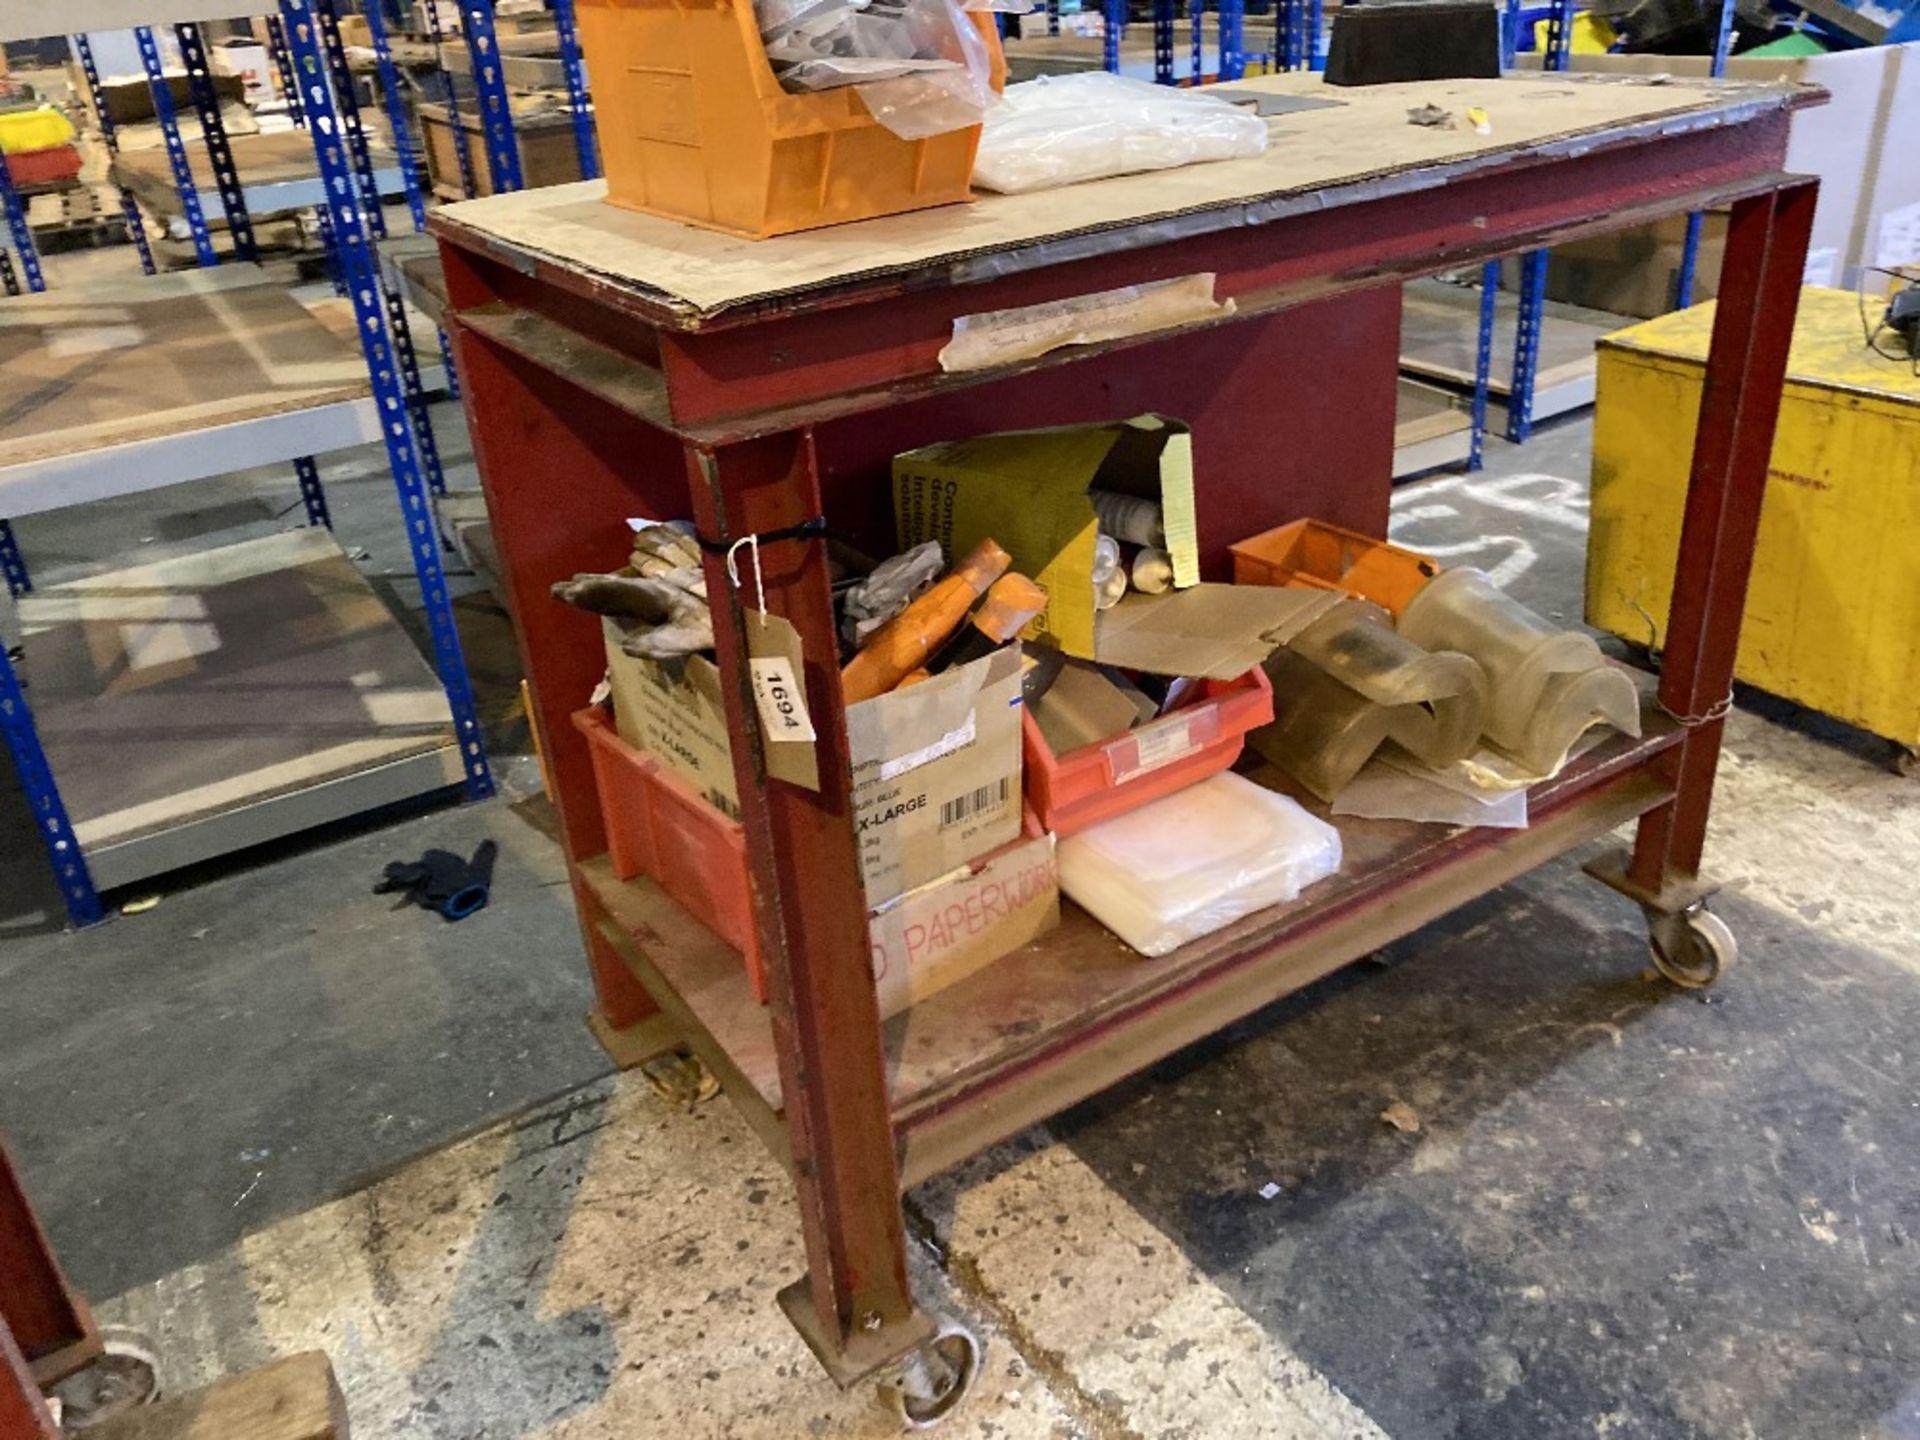 Steel framed mobile workbench - Image 3 of 3